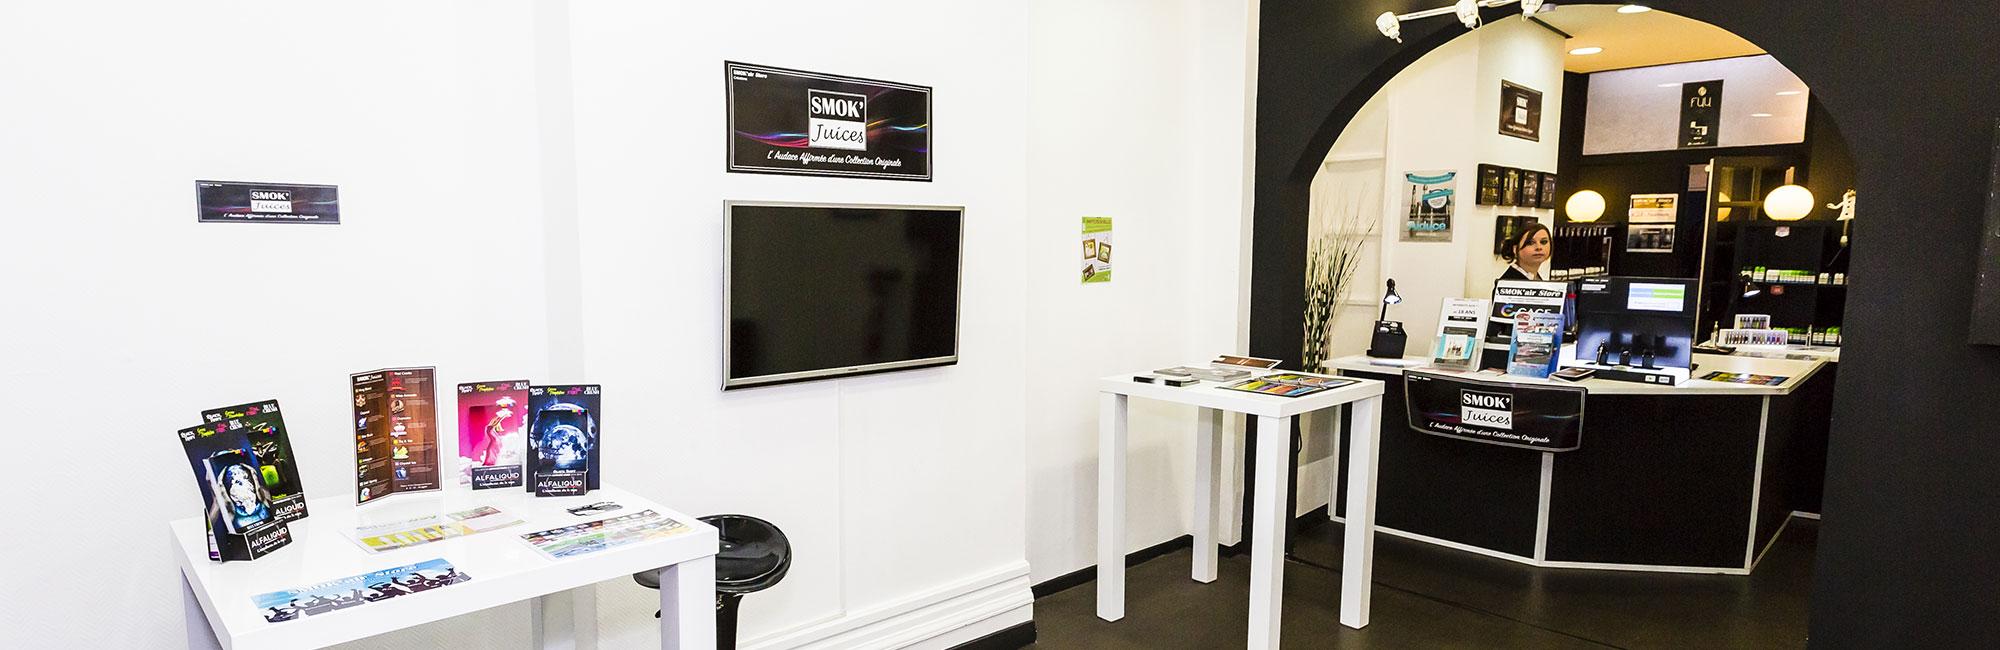 boulogne sur mer smok 39 air store. Black Bedroom Furniture Sets. Home Design Ideas